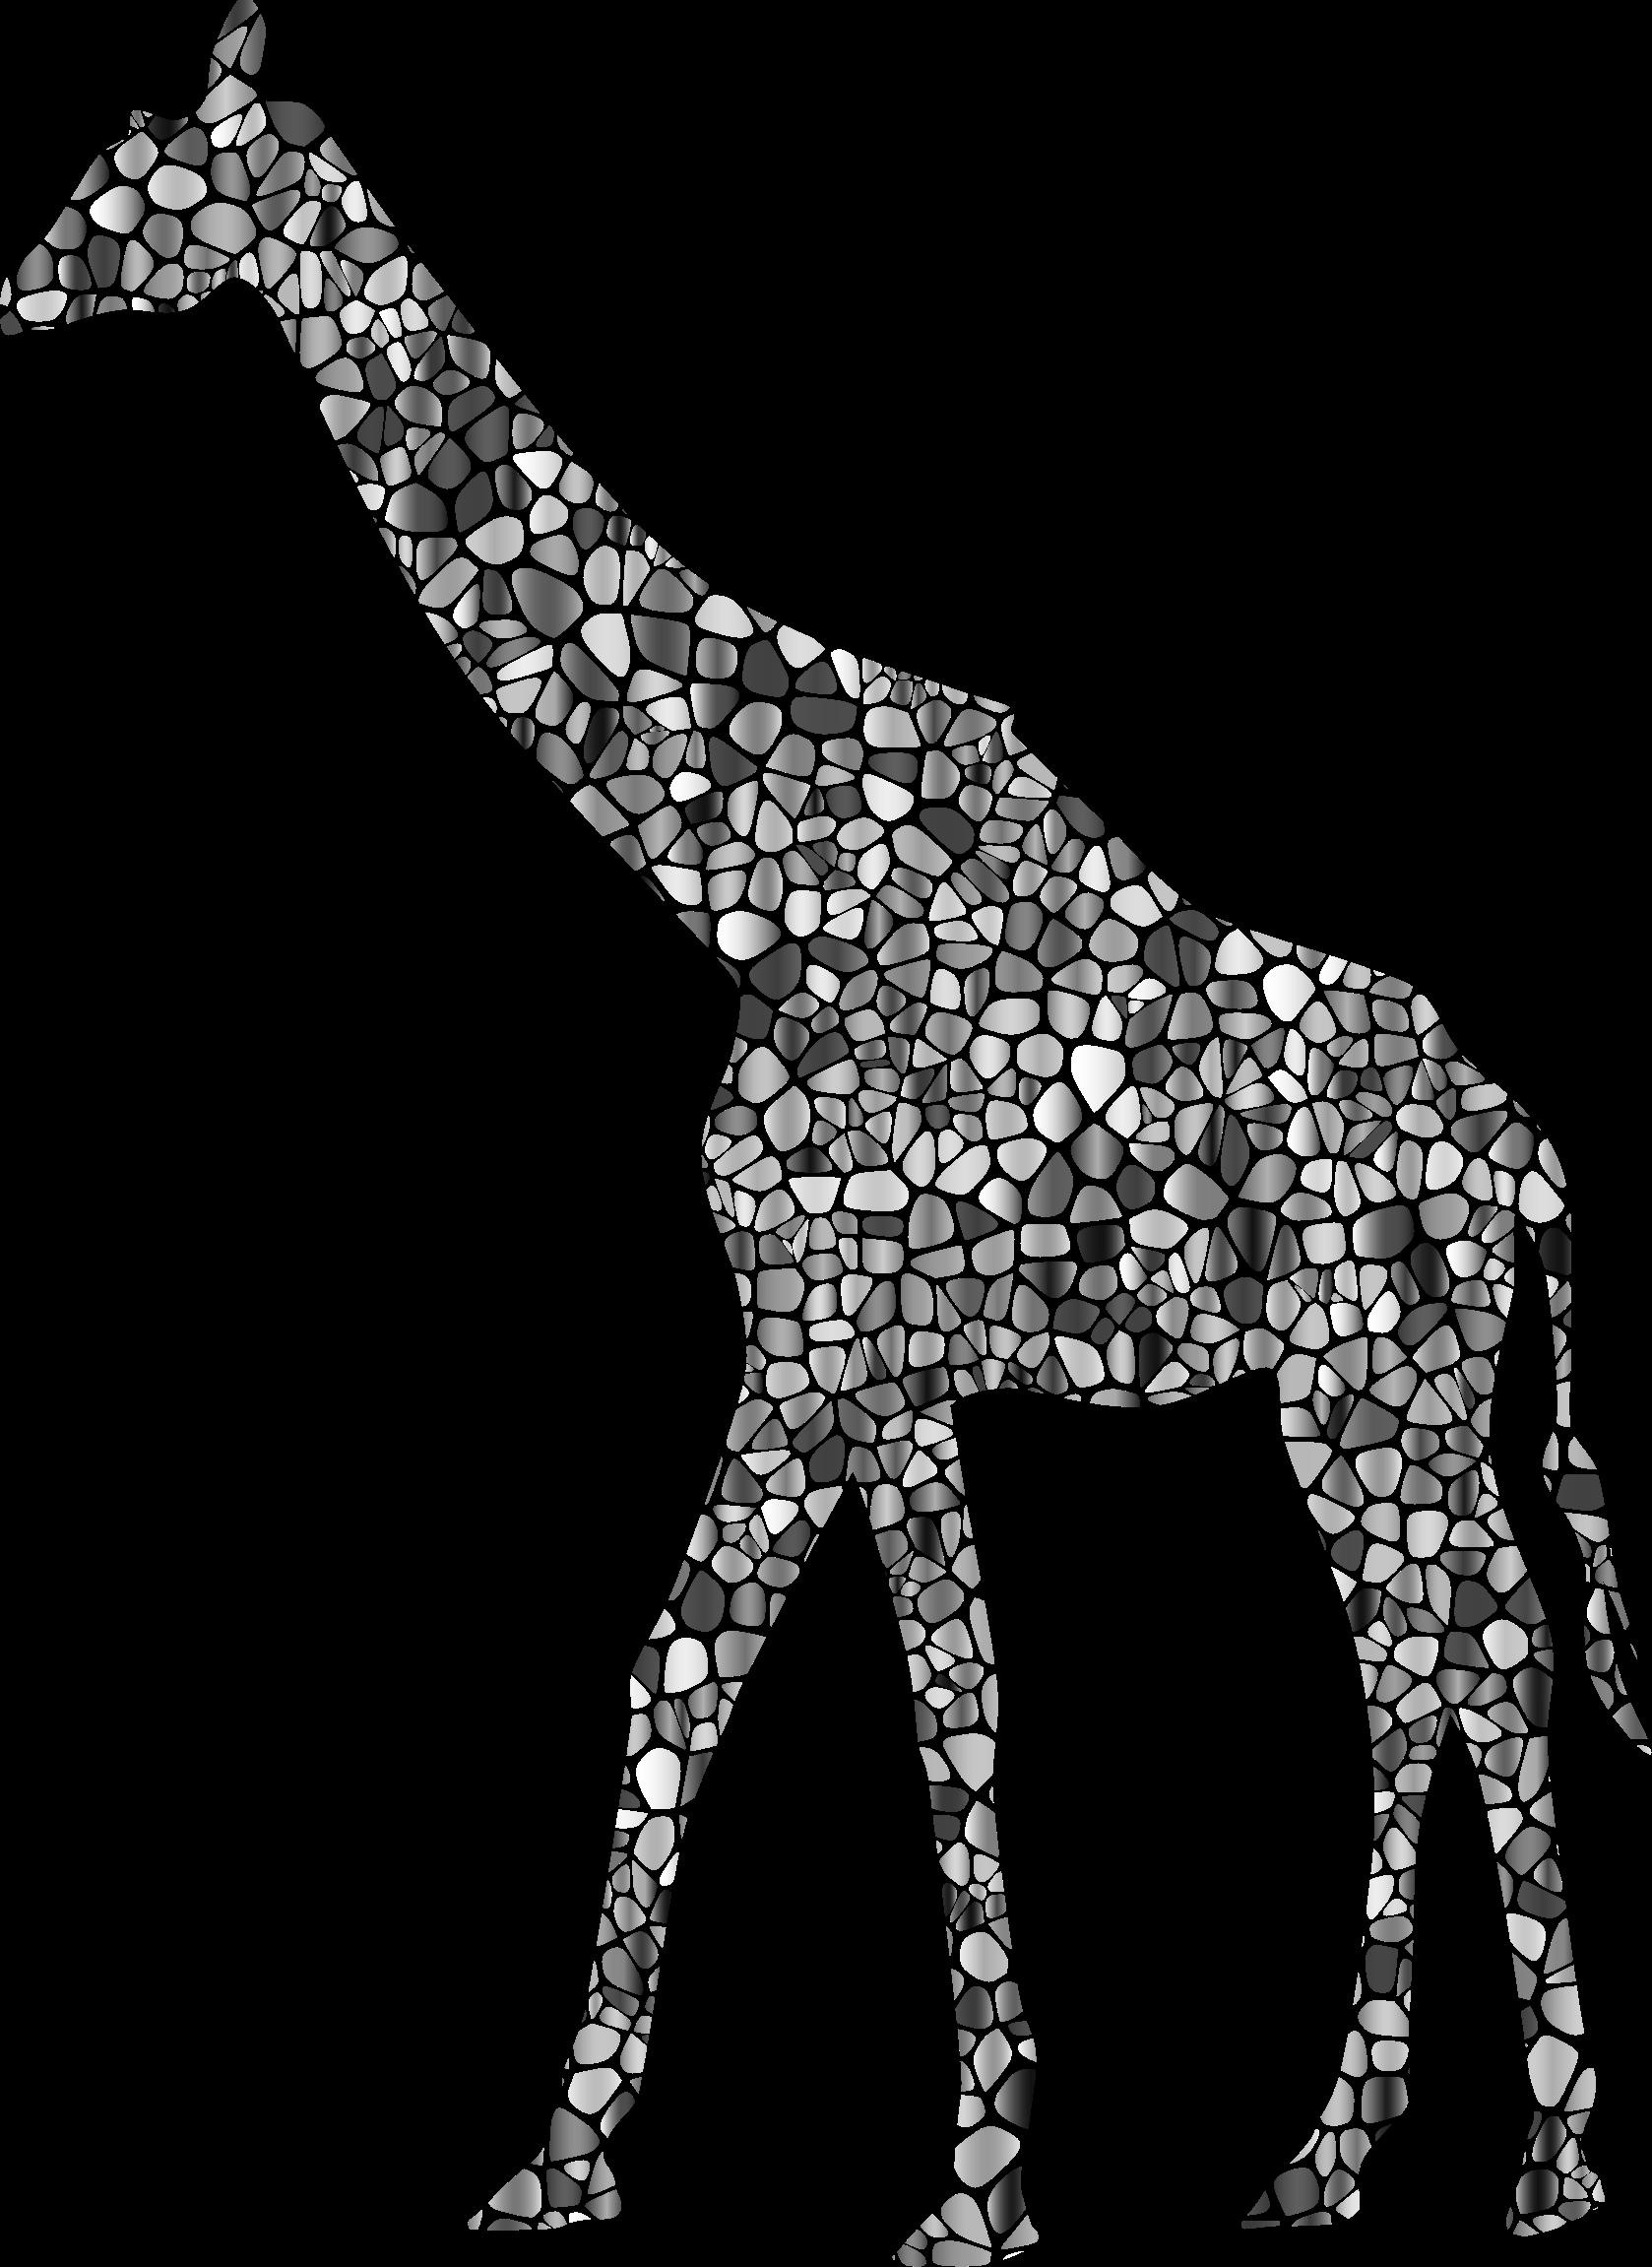 Giraffe clipart silhouette. Clipartblack com animal free